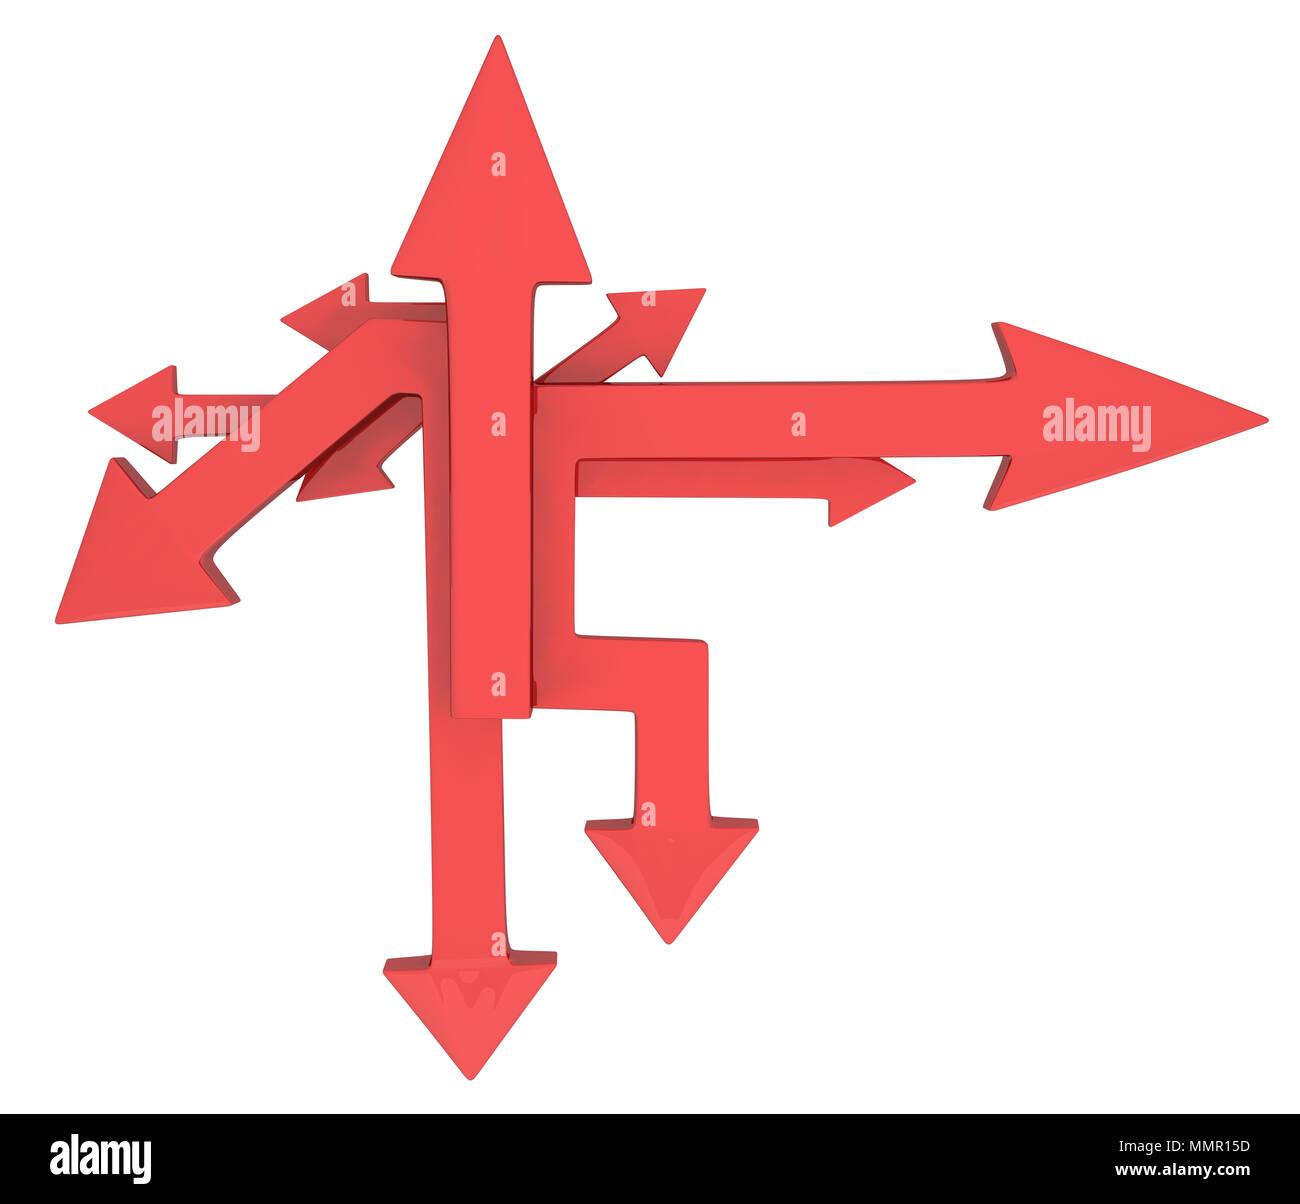 red arrow figure pointing symbol 3d illustration horizontal